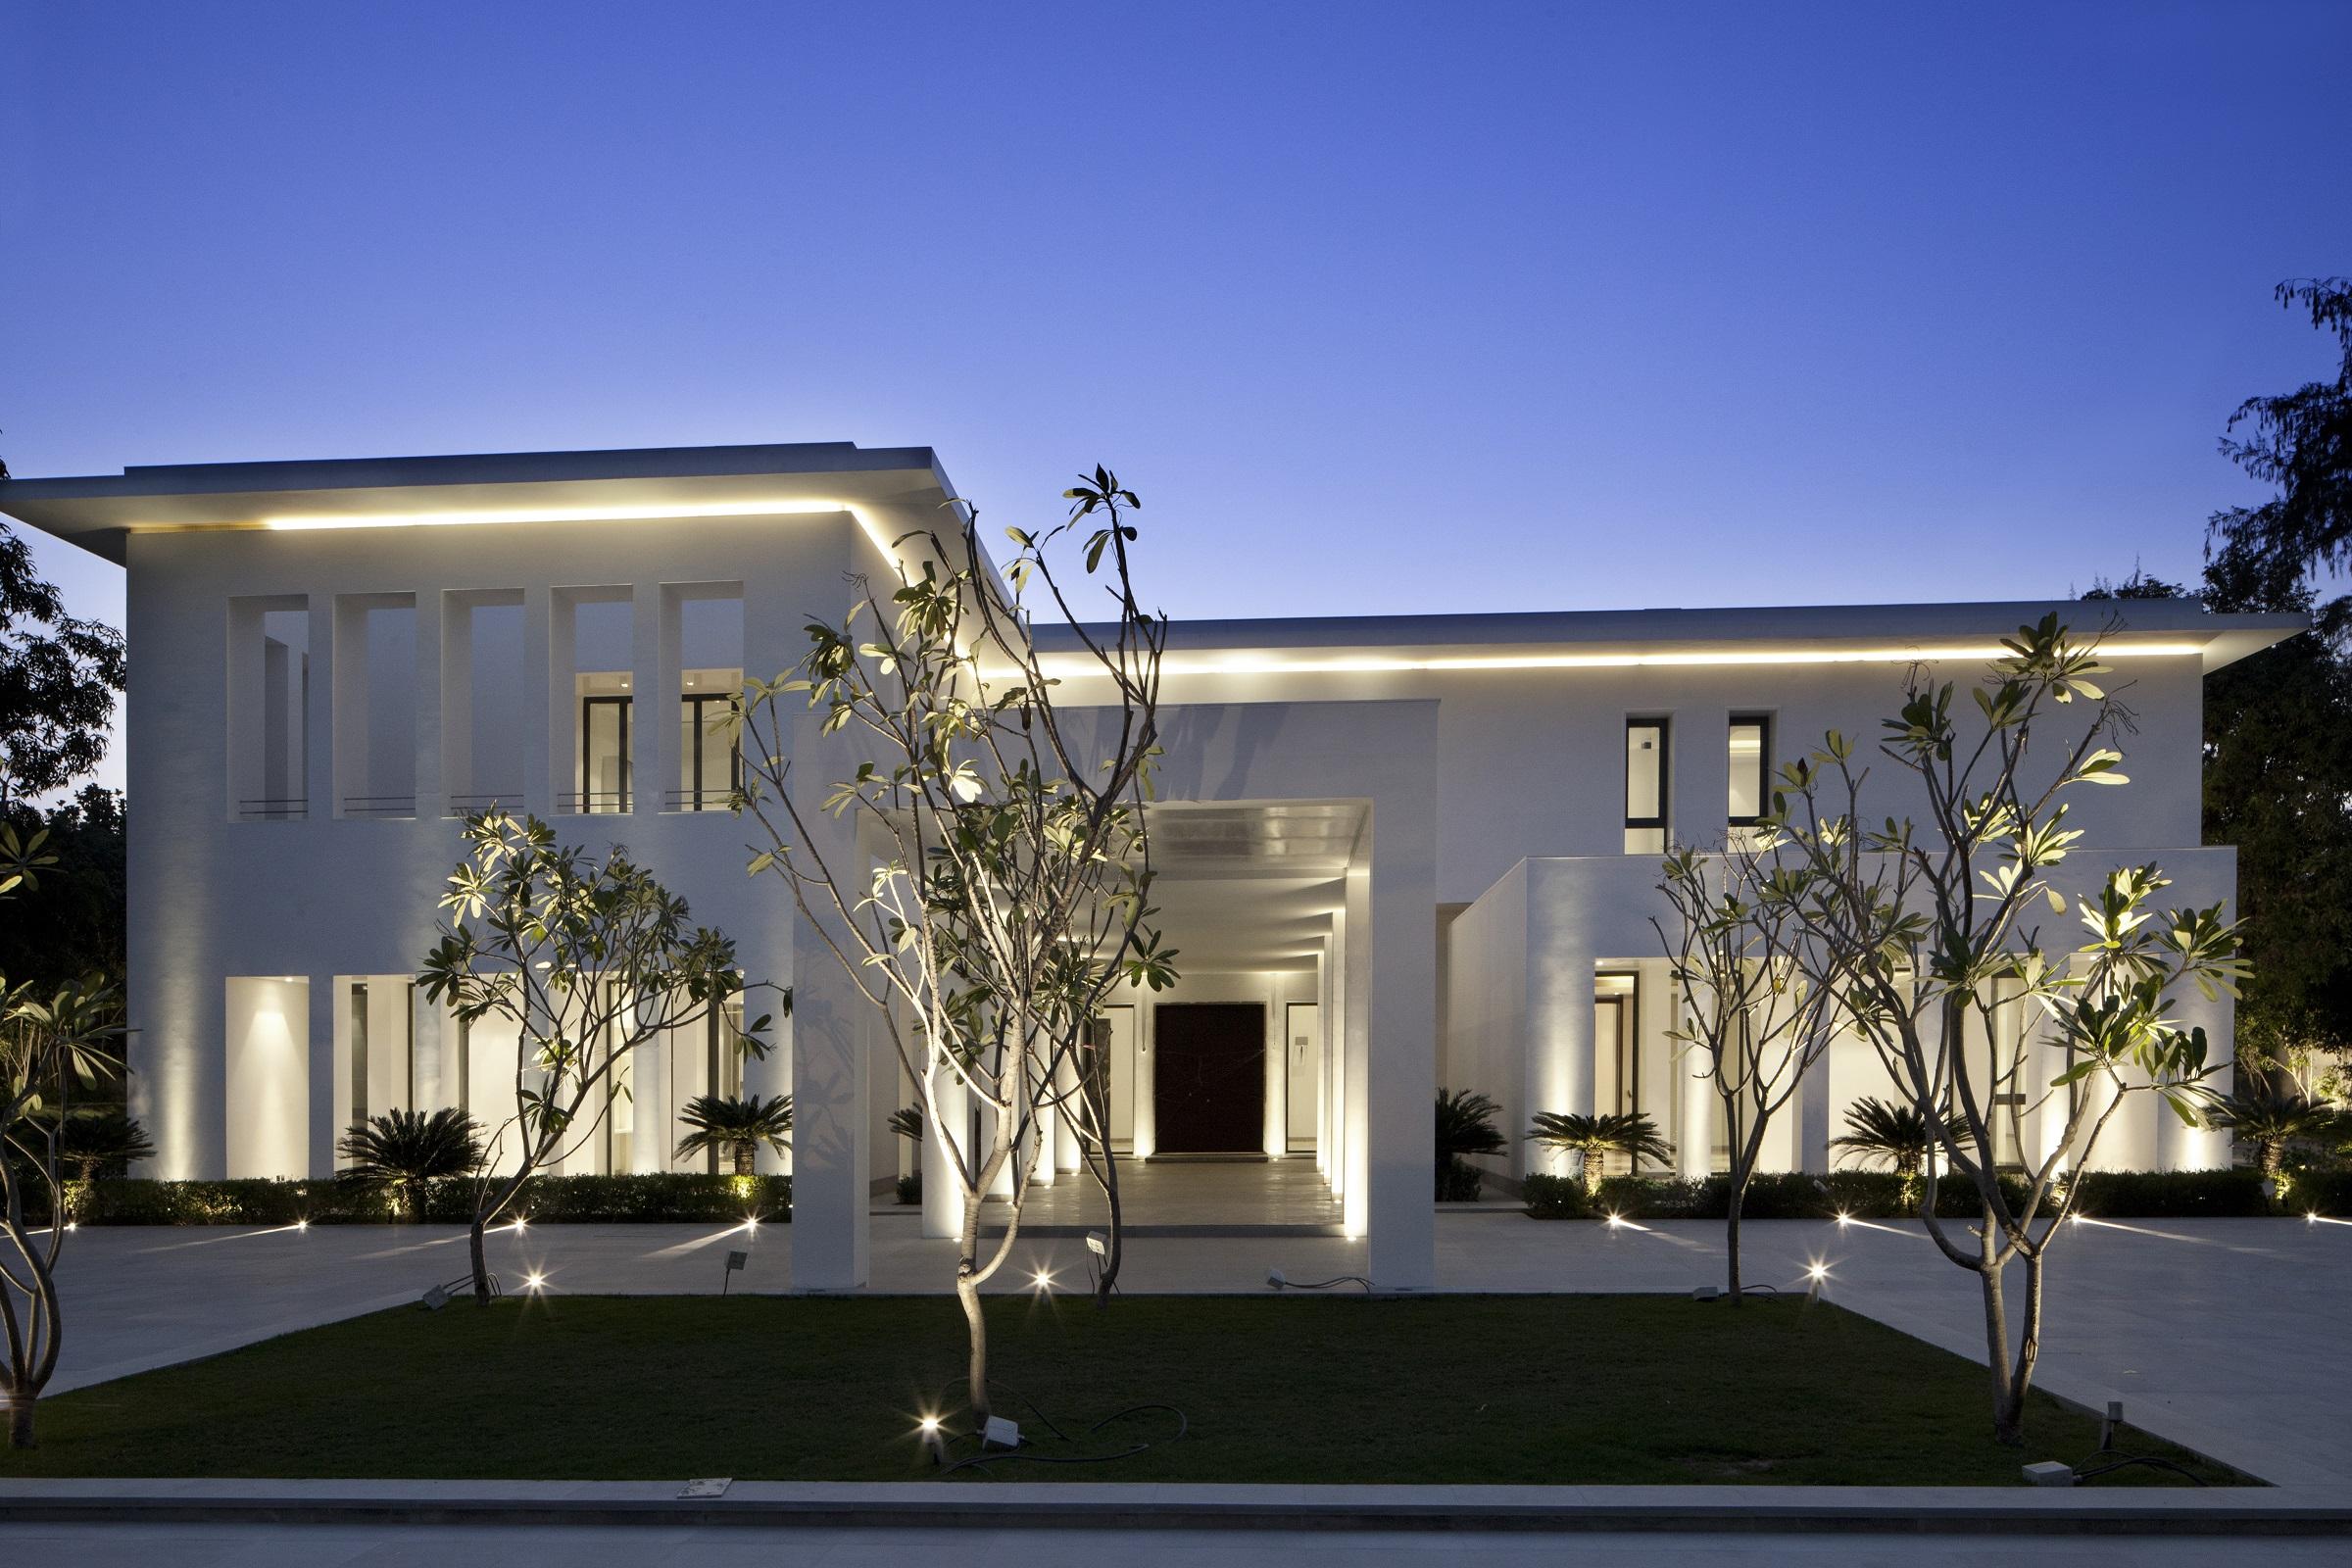 Other Residential for Sale at Amaya White Mansion Chattarpur New Delhi, Delhi 110074 India